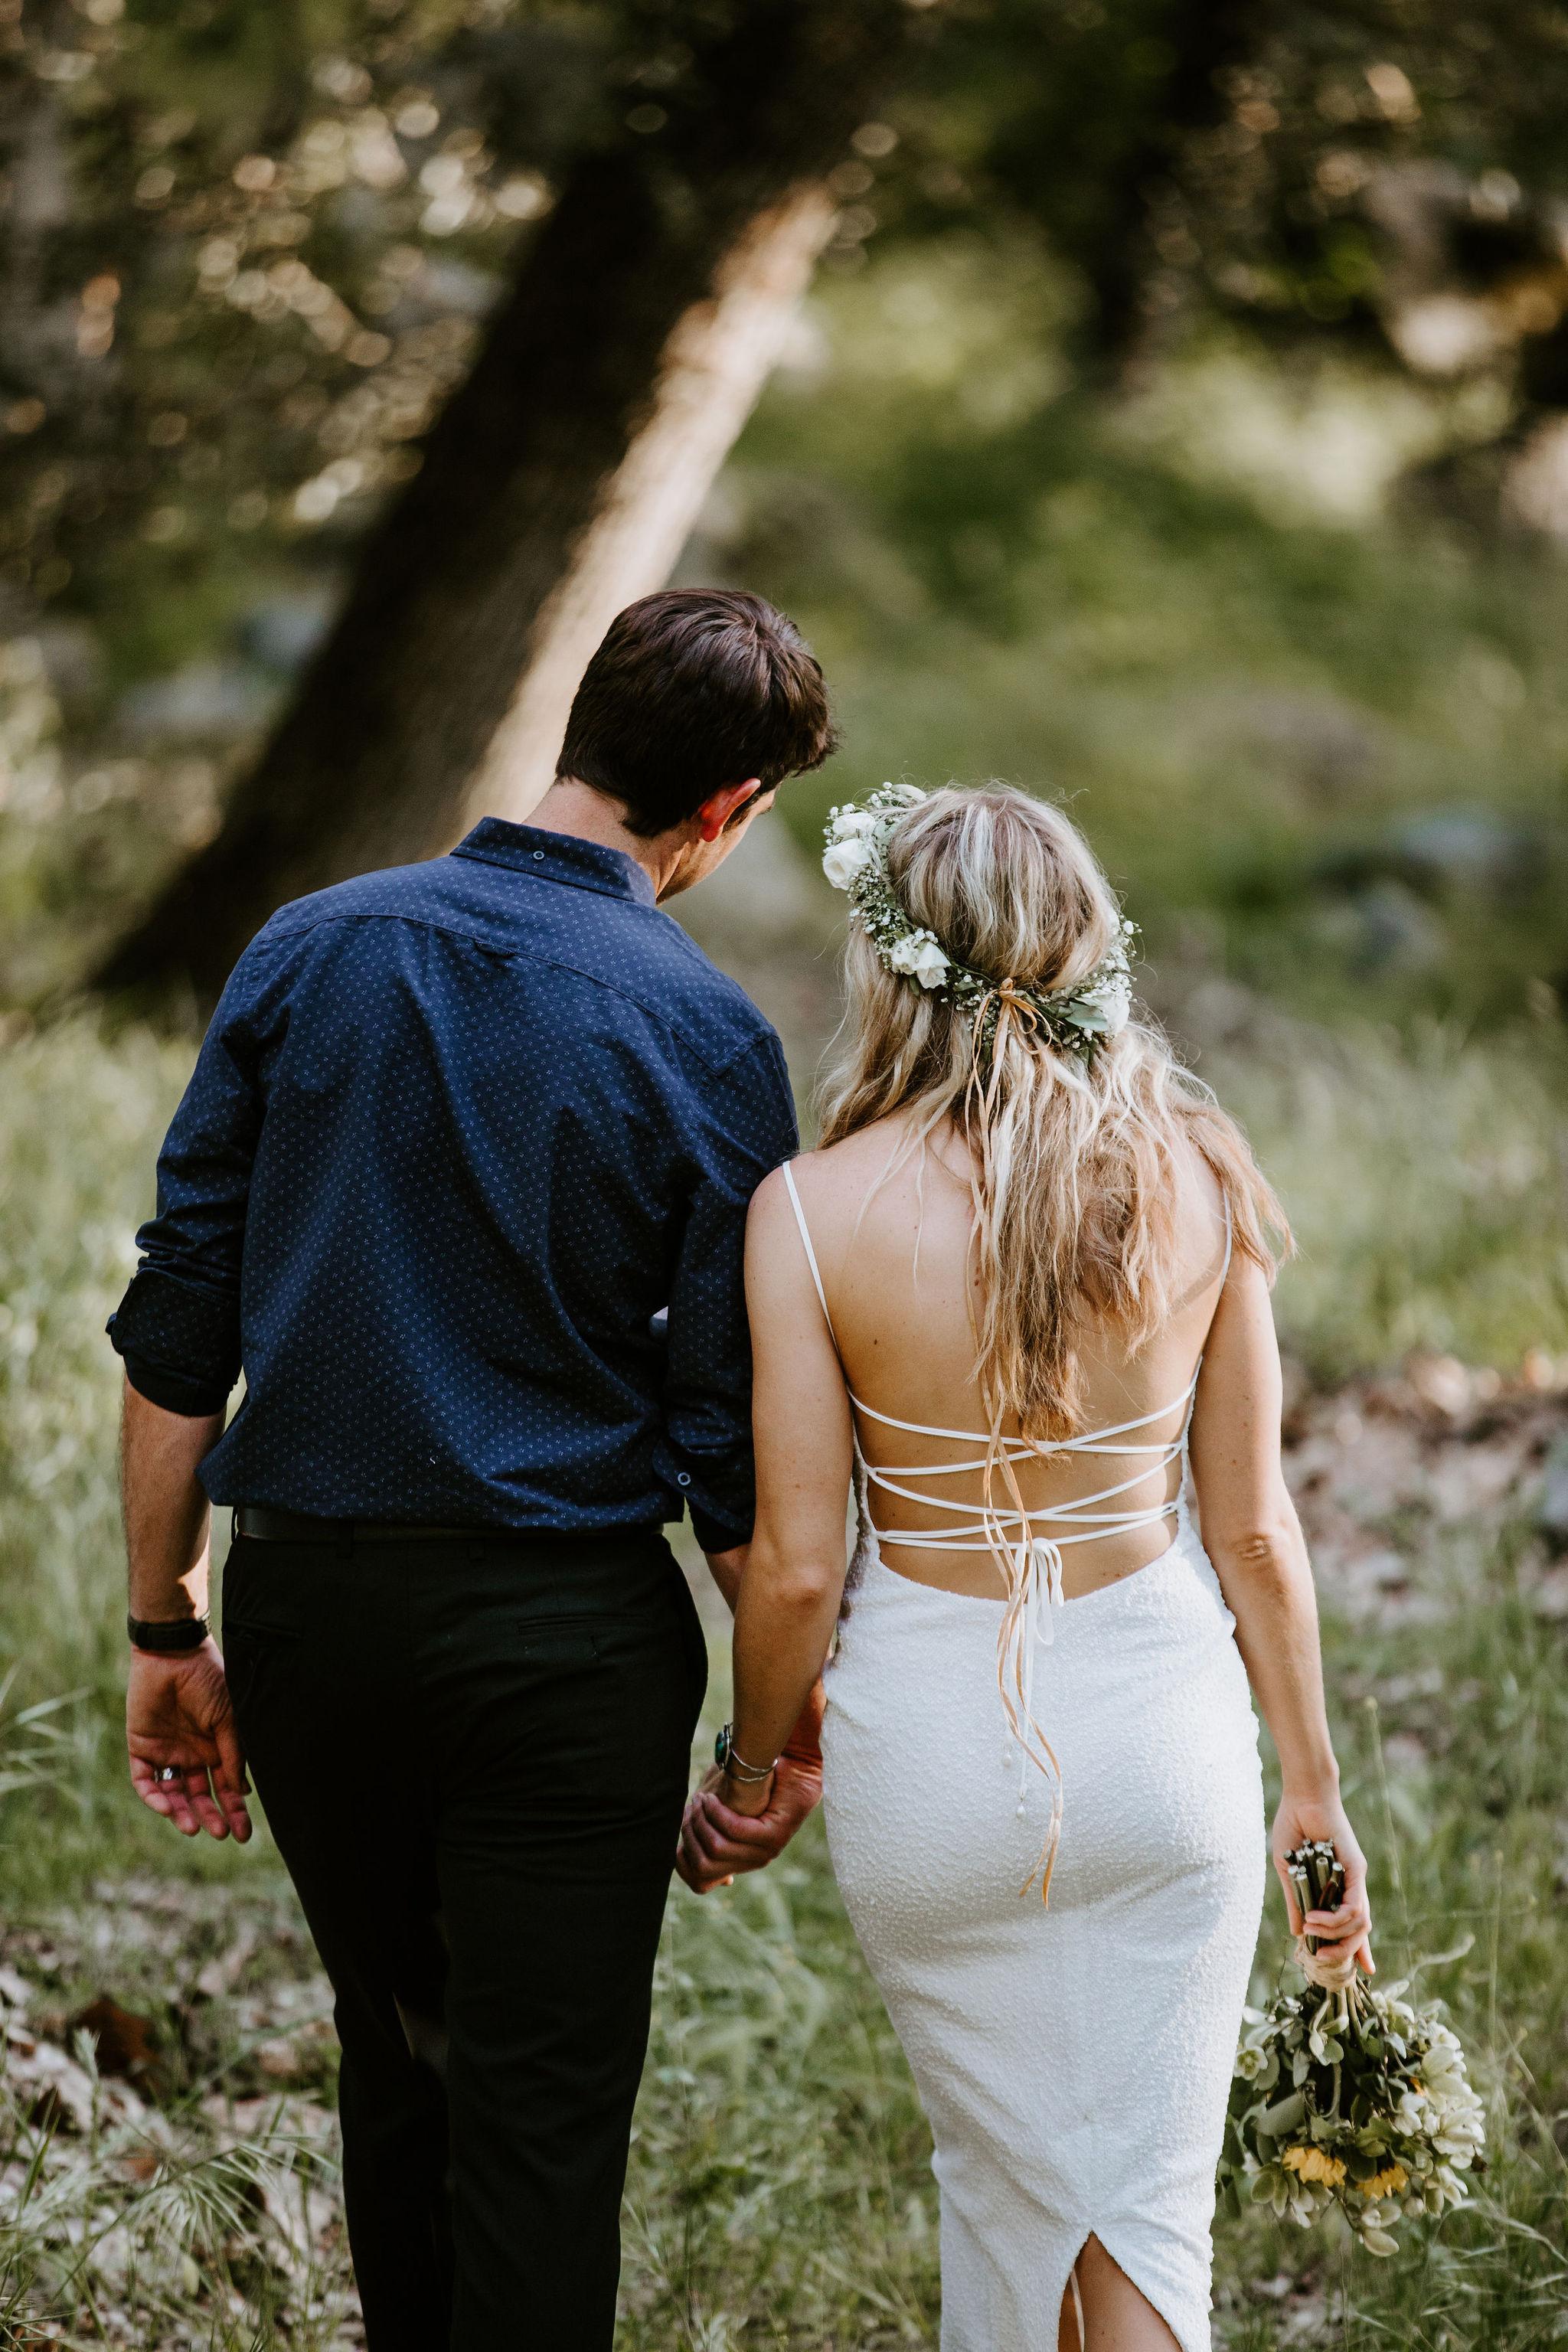 RedwoodRanch_Geoff&LyndsiPhotography_Mike&Amanda_Romantics21.jpg